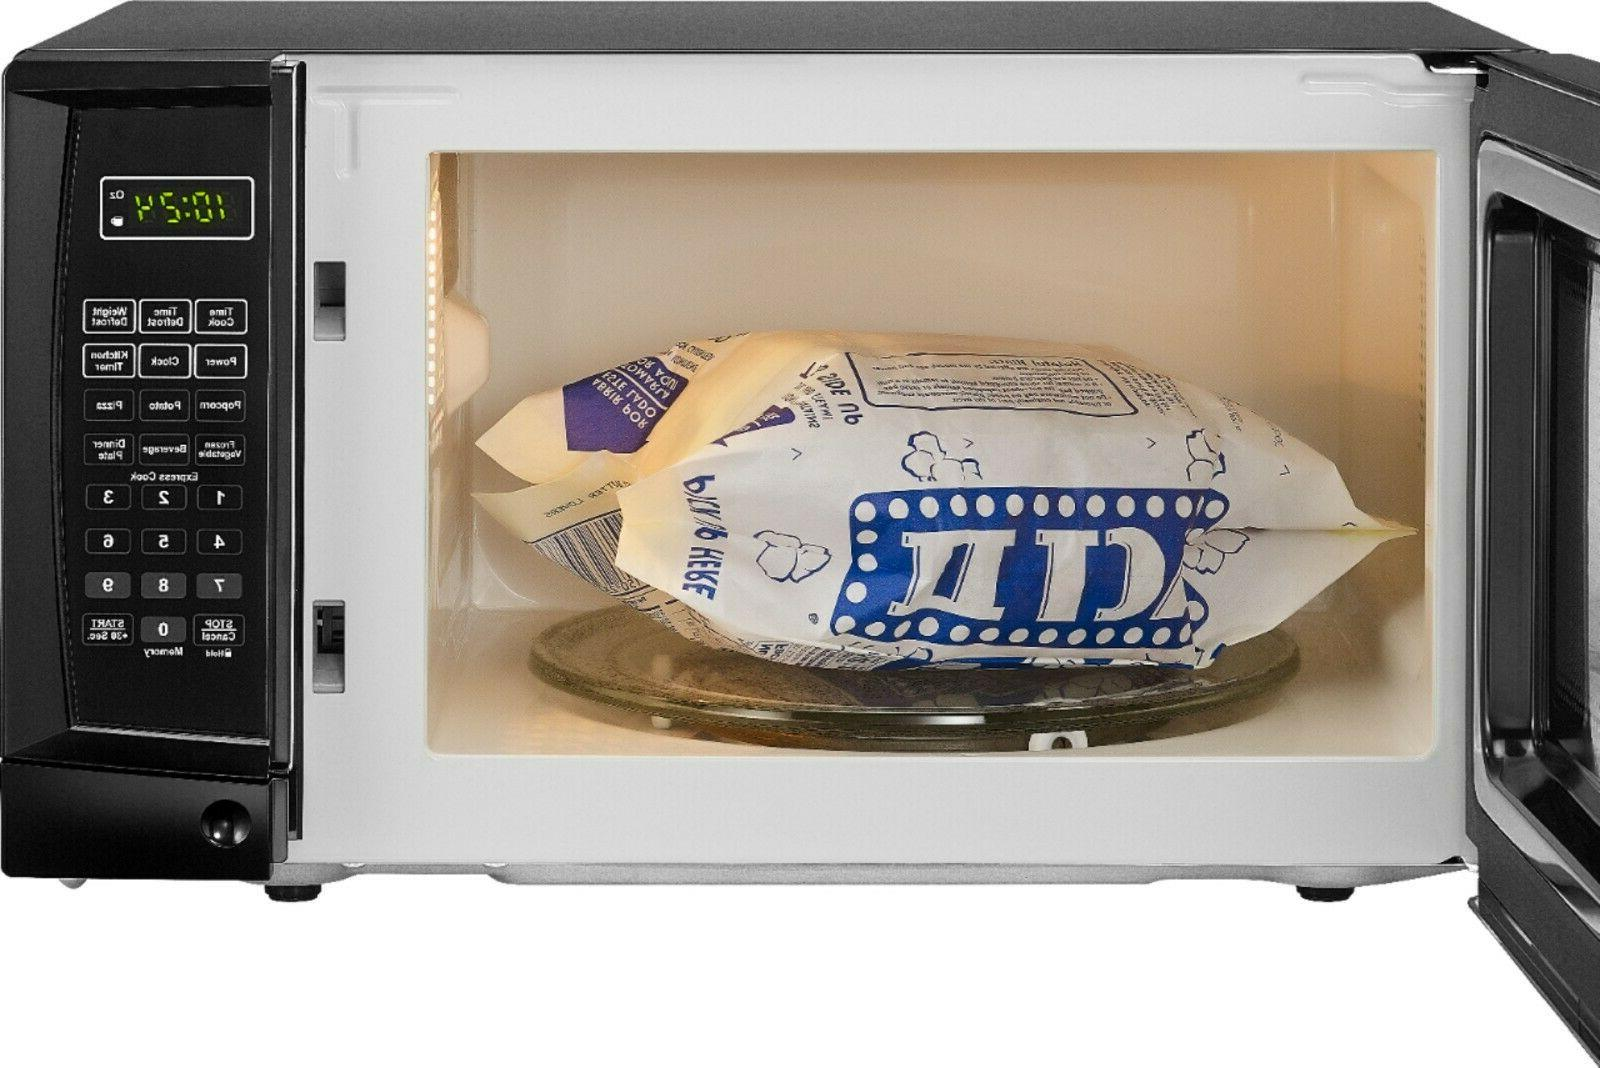 Microwave Countertop